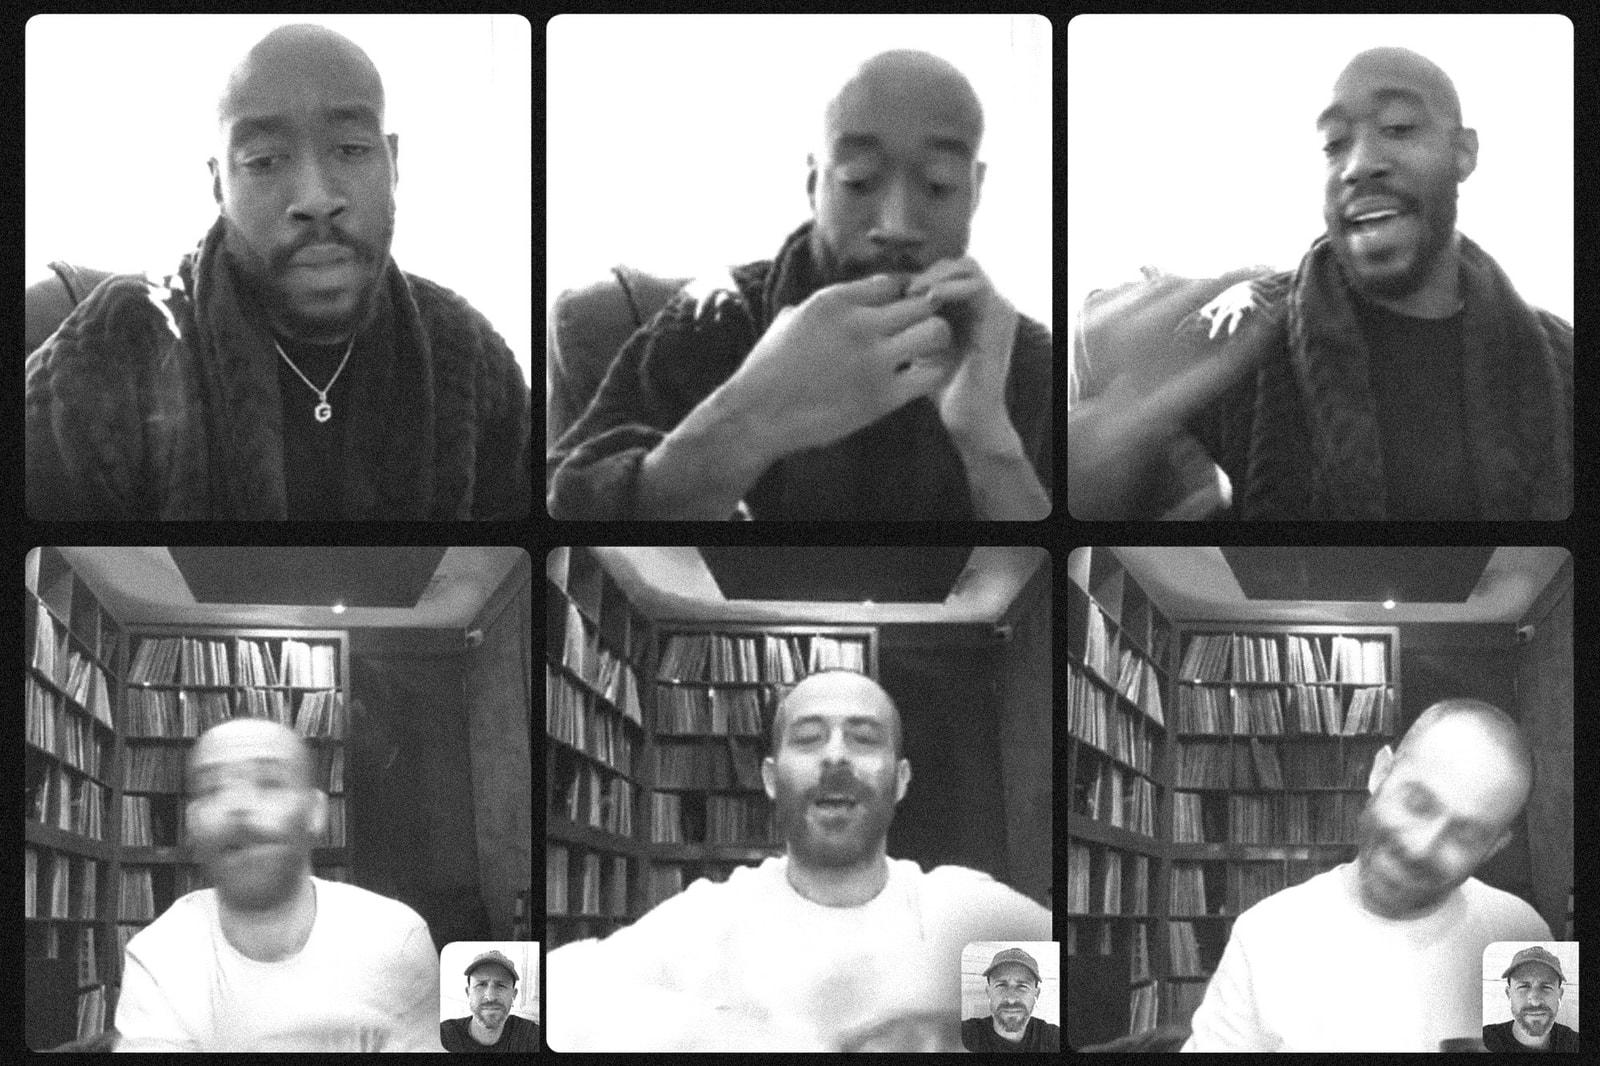 Freddie Gibbs The Alchemist Alfredo Album Interview HYPEBEAST Music Rap HipHop Hip Hop Rapper Best New Tracks ESGN Bandana Madlib Warner Records Keep Cool Pinata Fetti